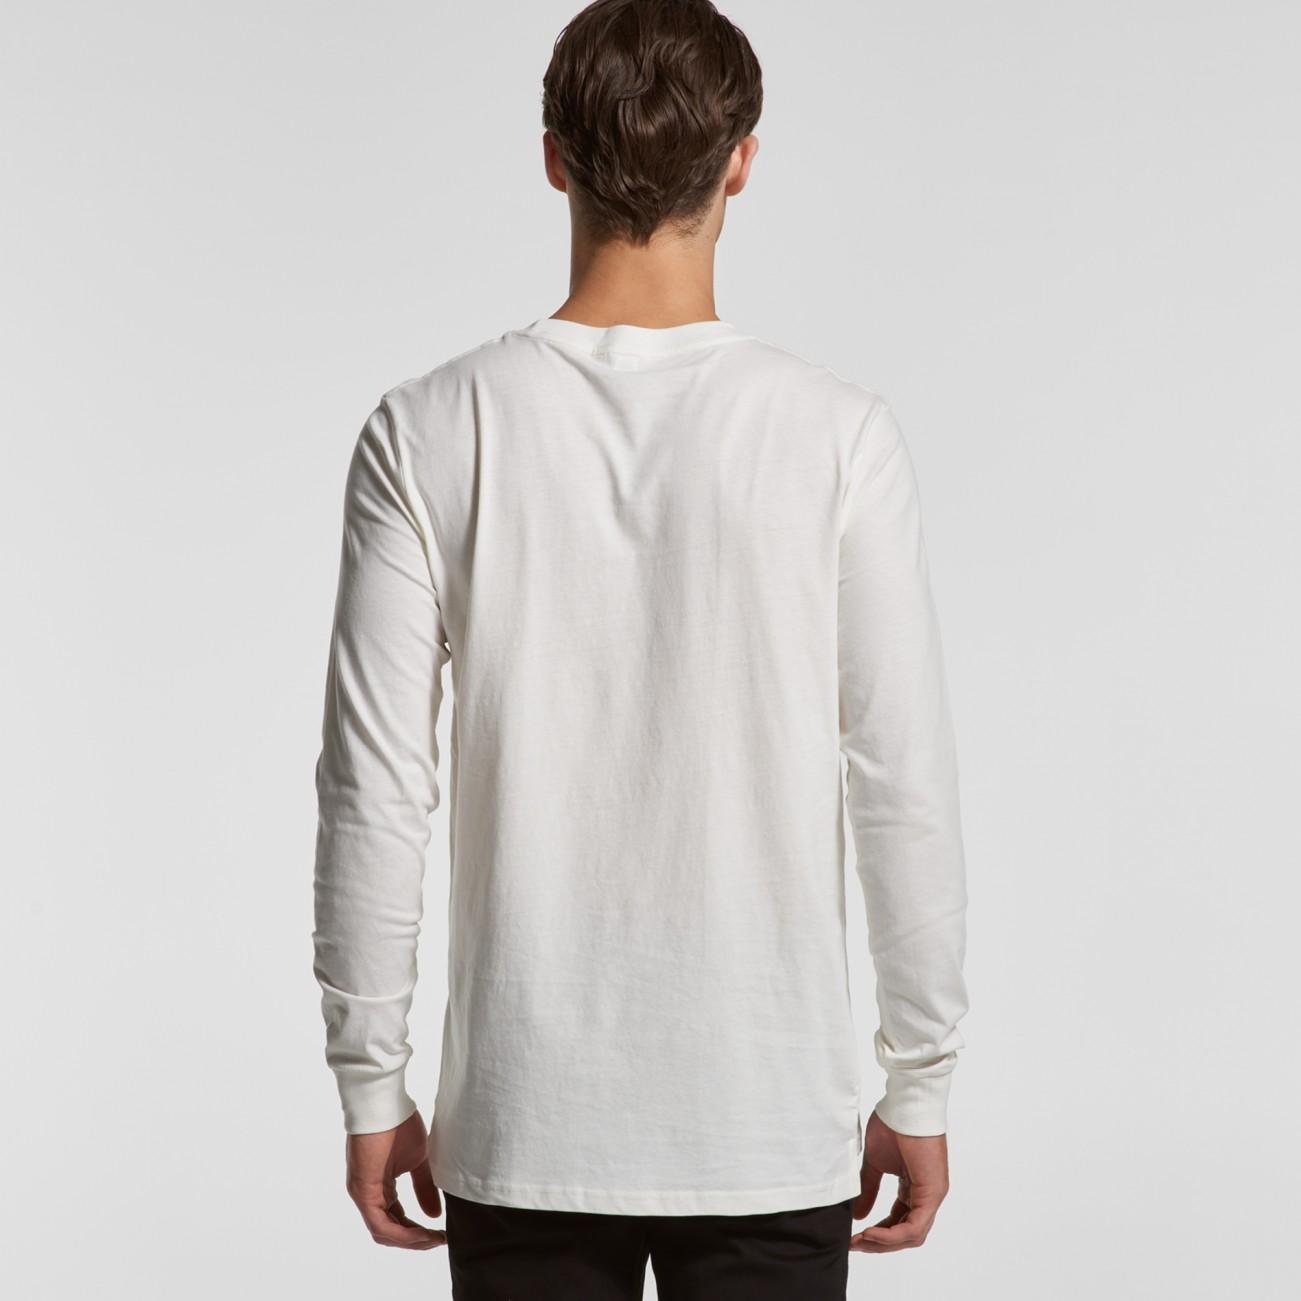 Men's AS Colour Base long sleeve organic t-shirts.